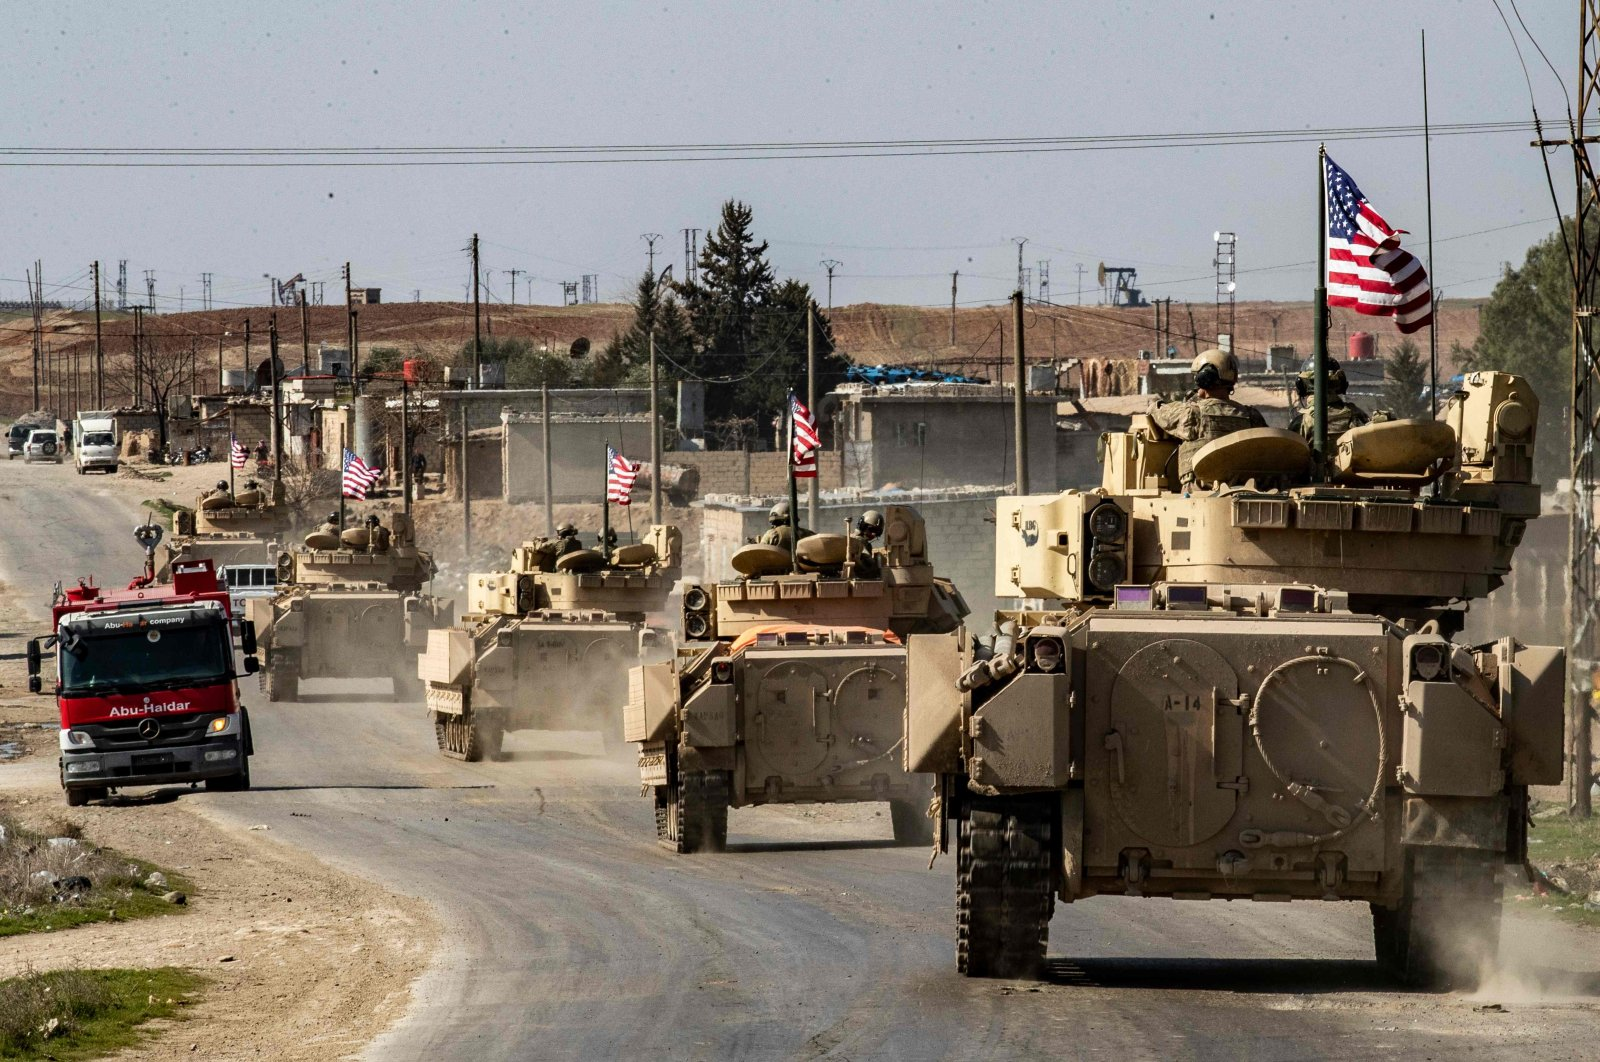 U.S. Bradley Fighting Vehicles (BFV) patrol in the Suwaydiyah oil fields in Hassakeh province, northeastern Syria, Feb. 13, 2021. (AFP Photo)